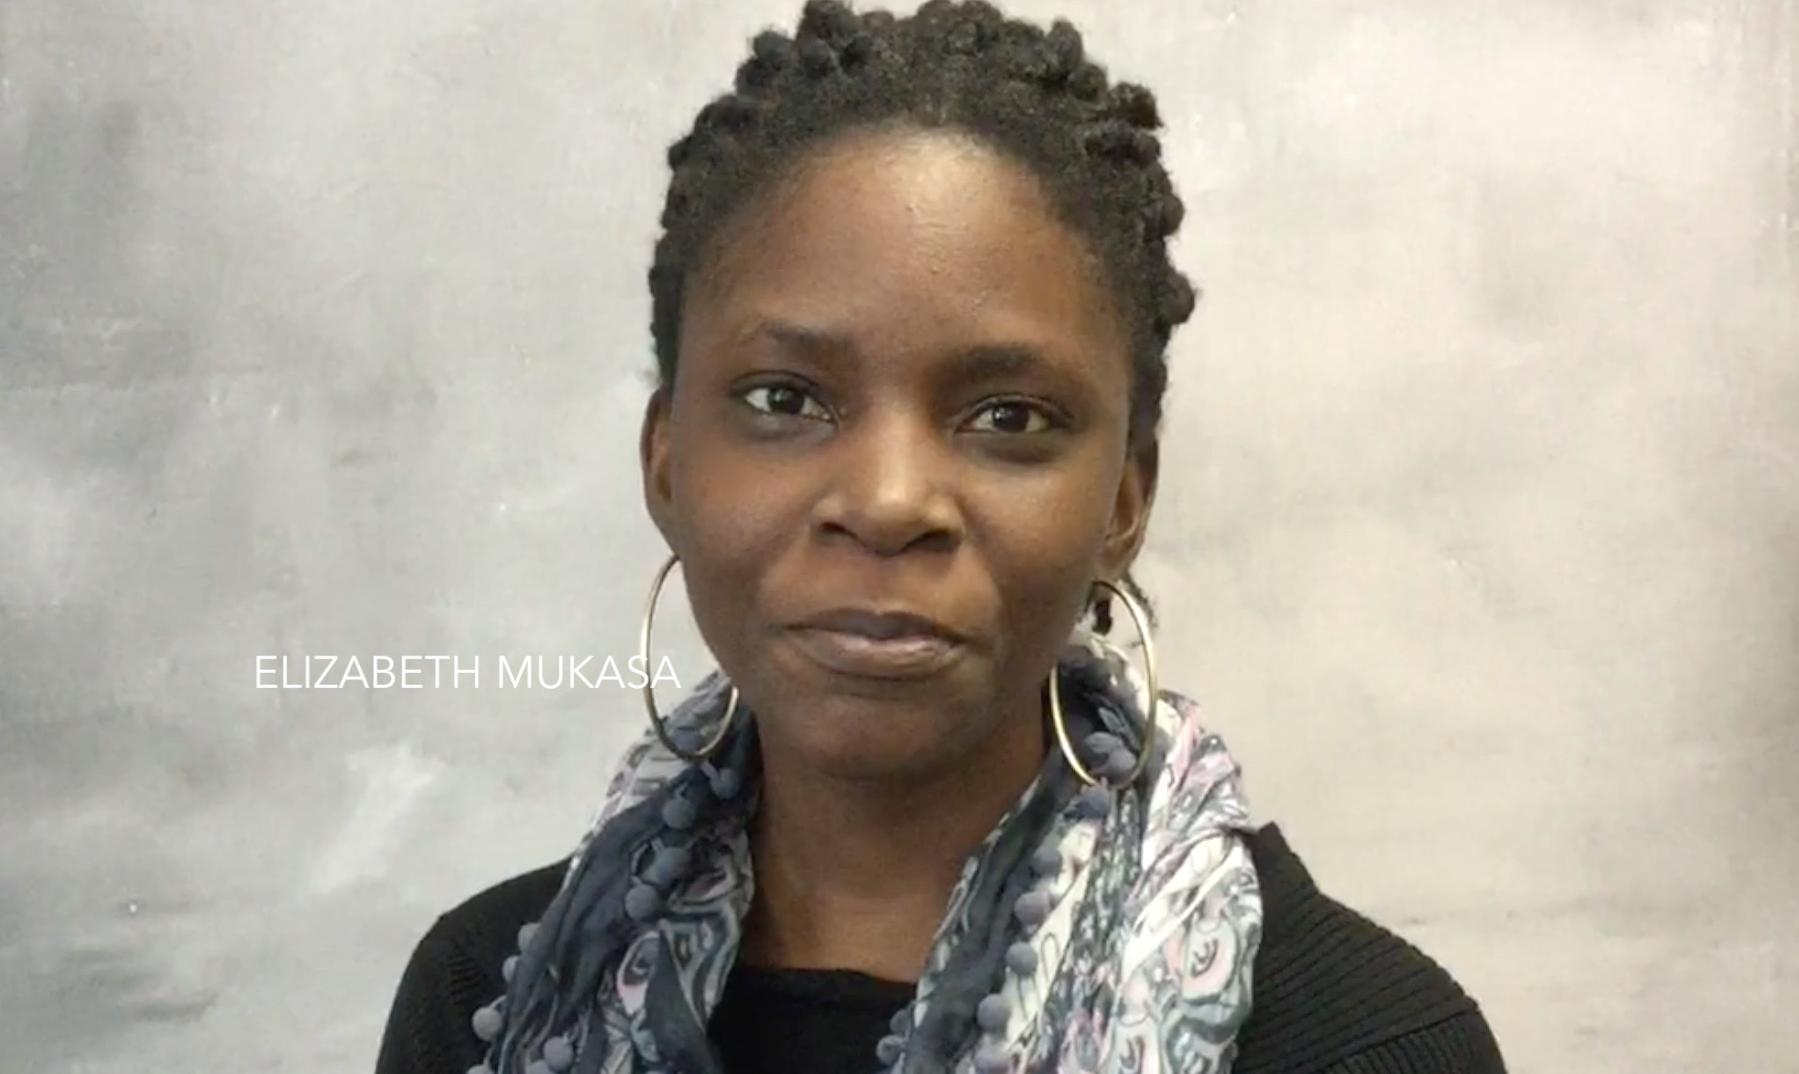 Elizabeth Mukasa